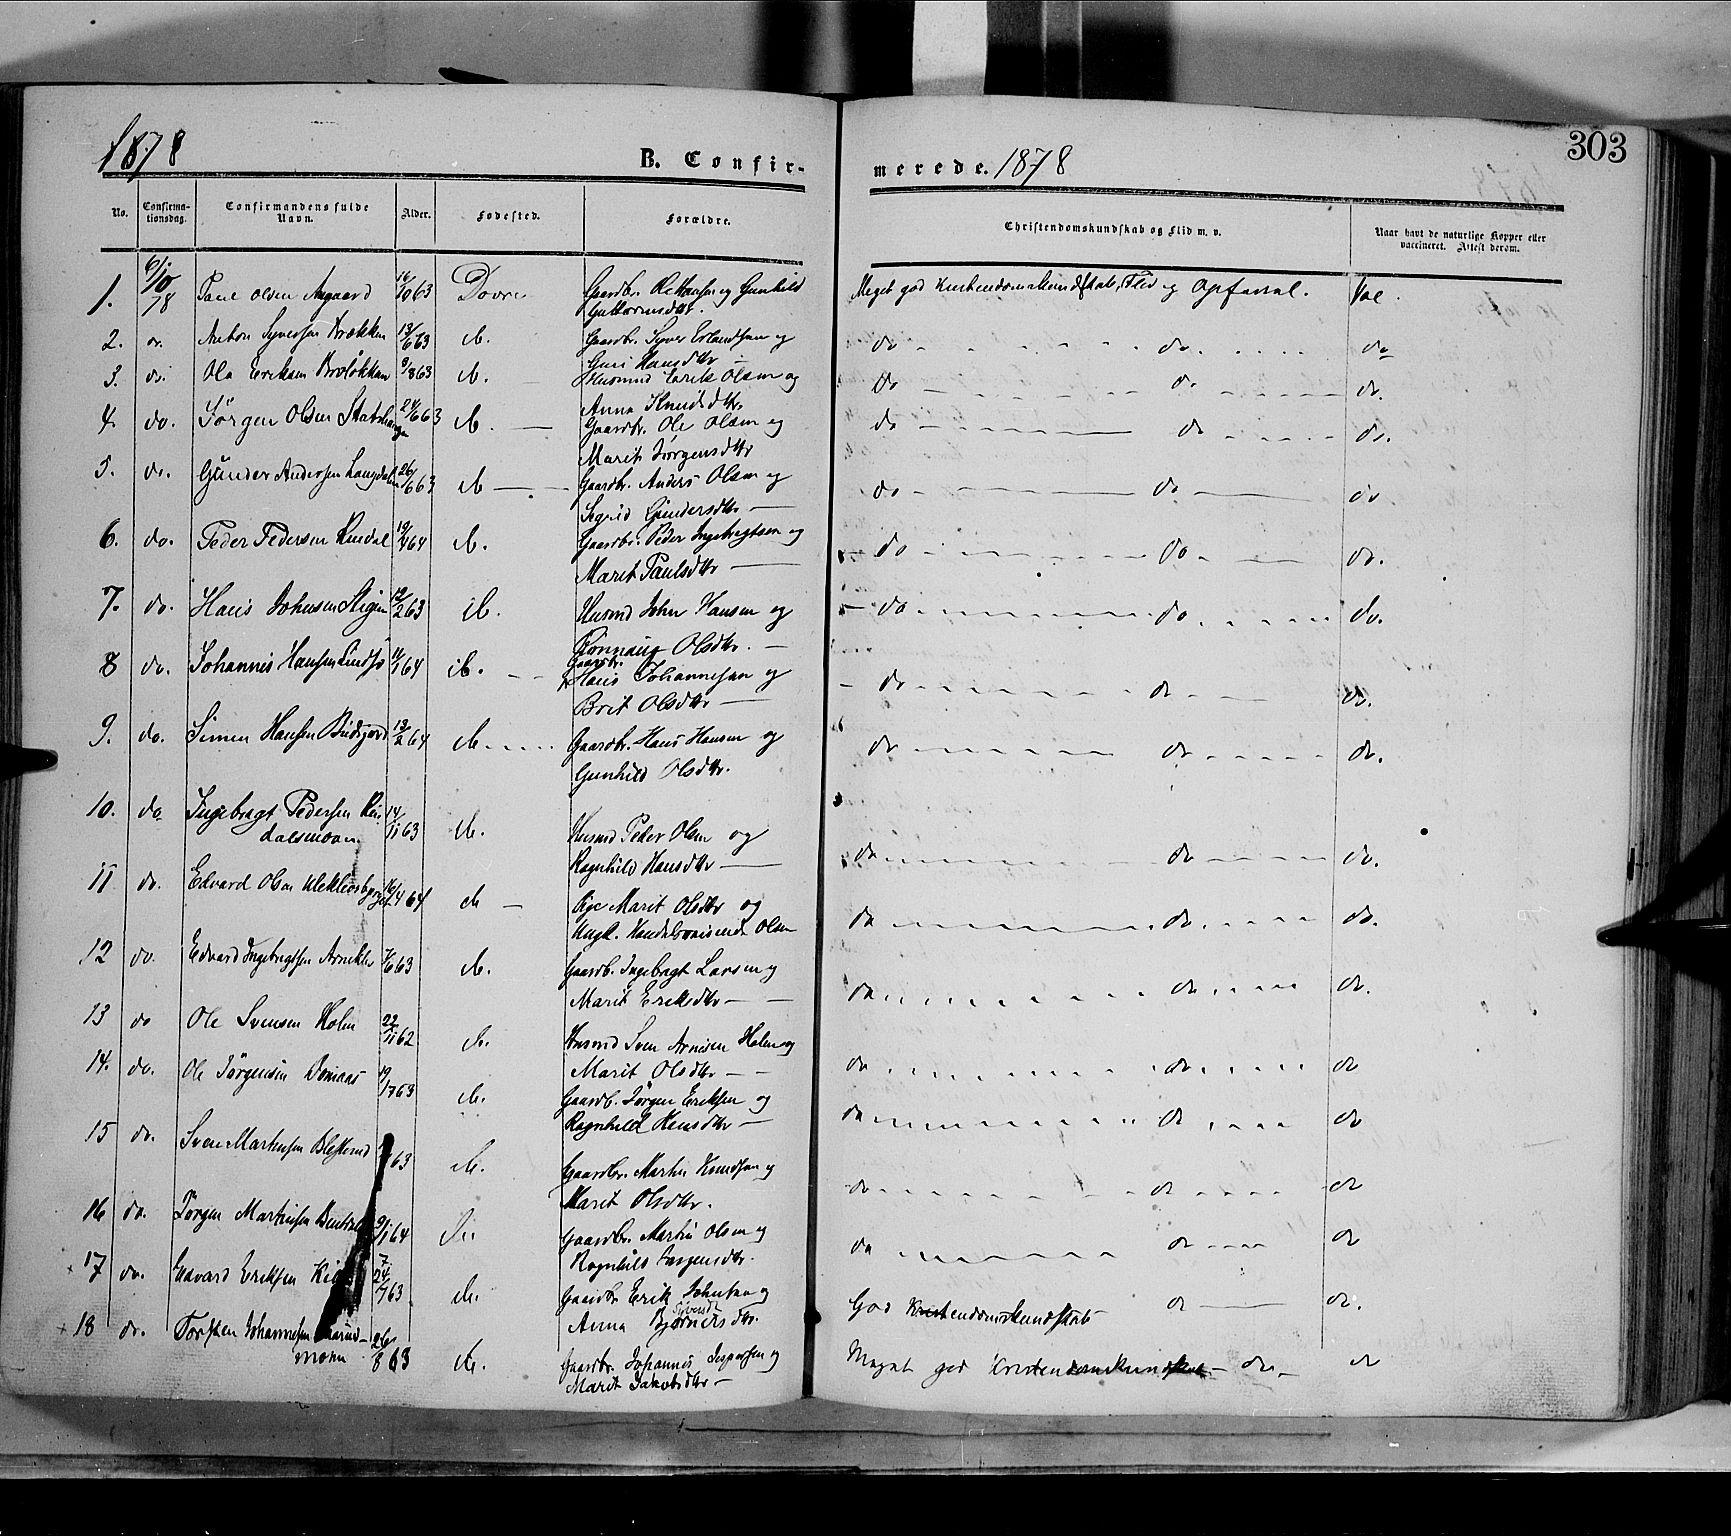 SAH, Dovre prestekontor, Parish register (official) no. 1, 1854-1878, p. 303